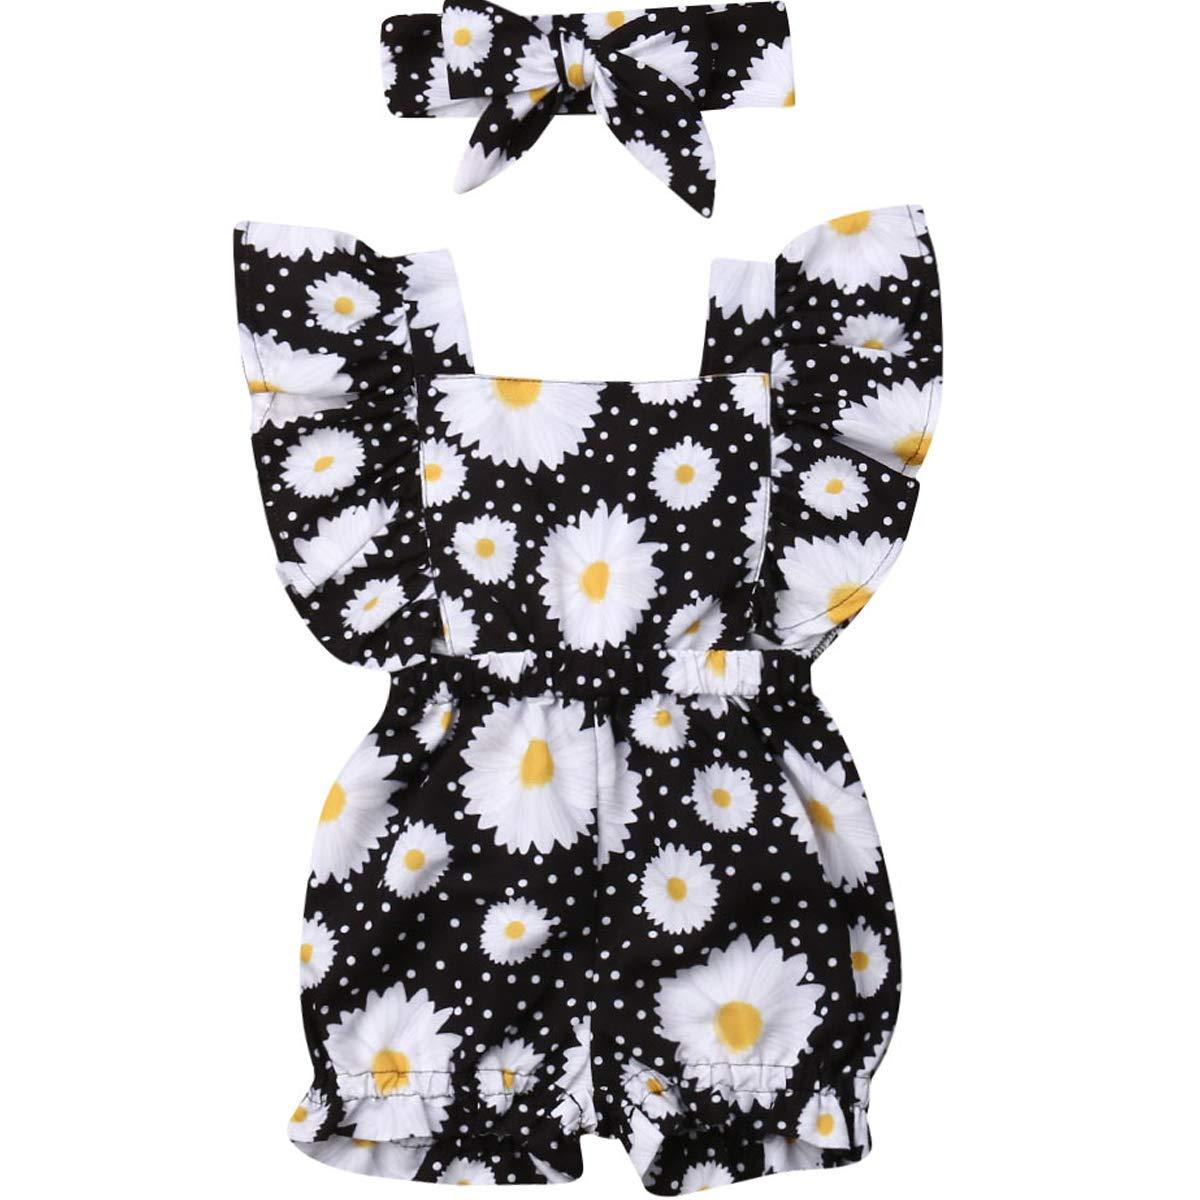 Amazon.com: Bebé recién nacido niña Floral Volantes Bowknot ...